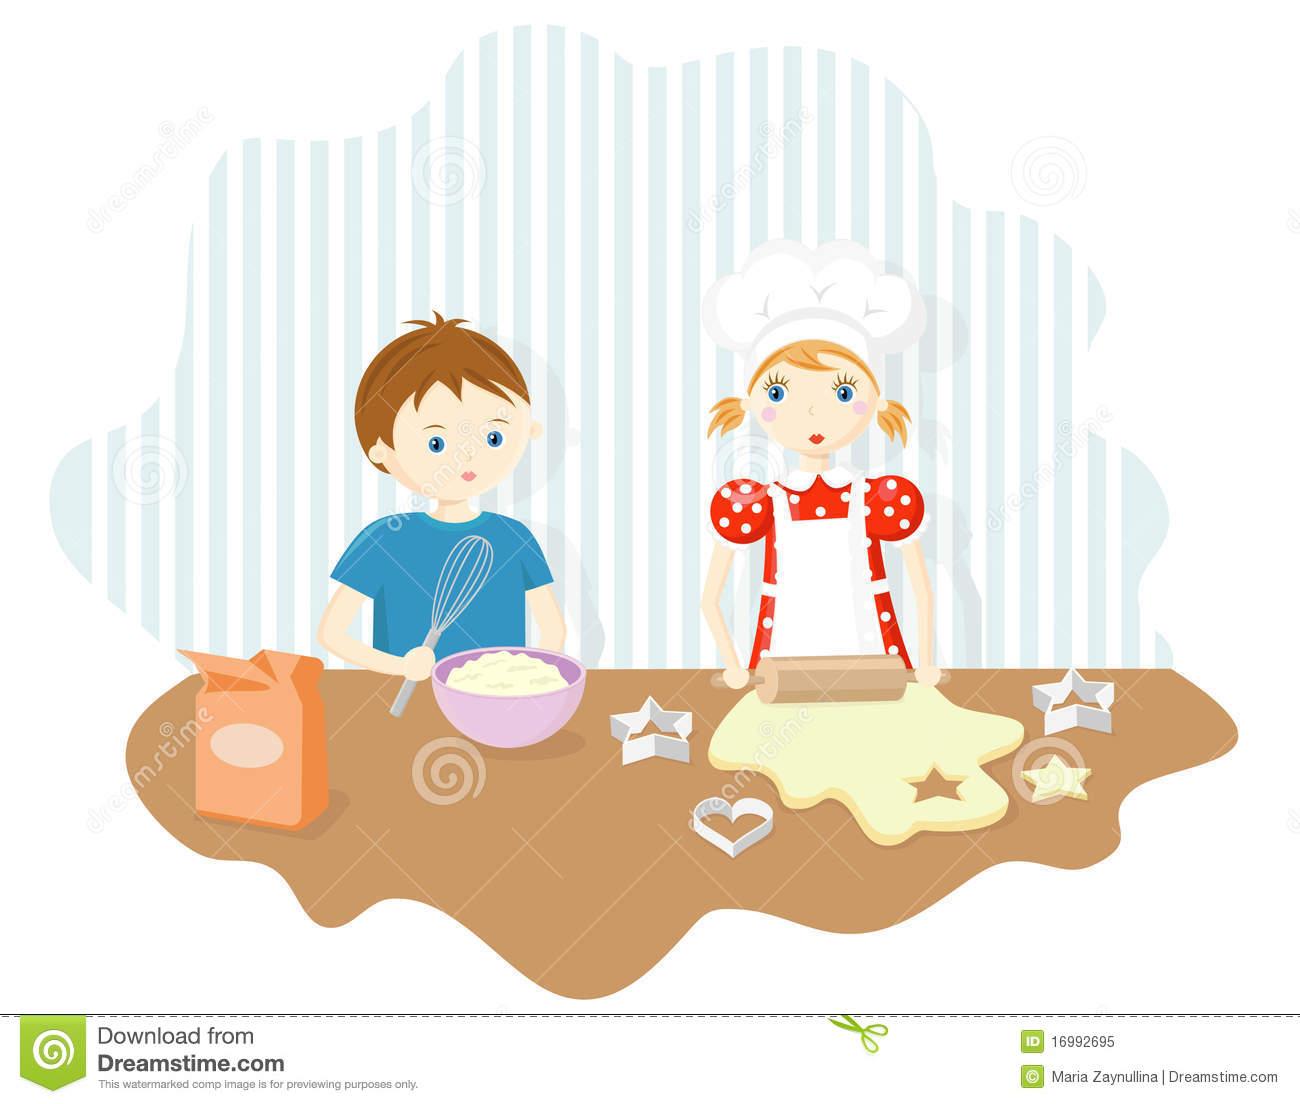 Baking clipart cartoon. Boy